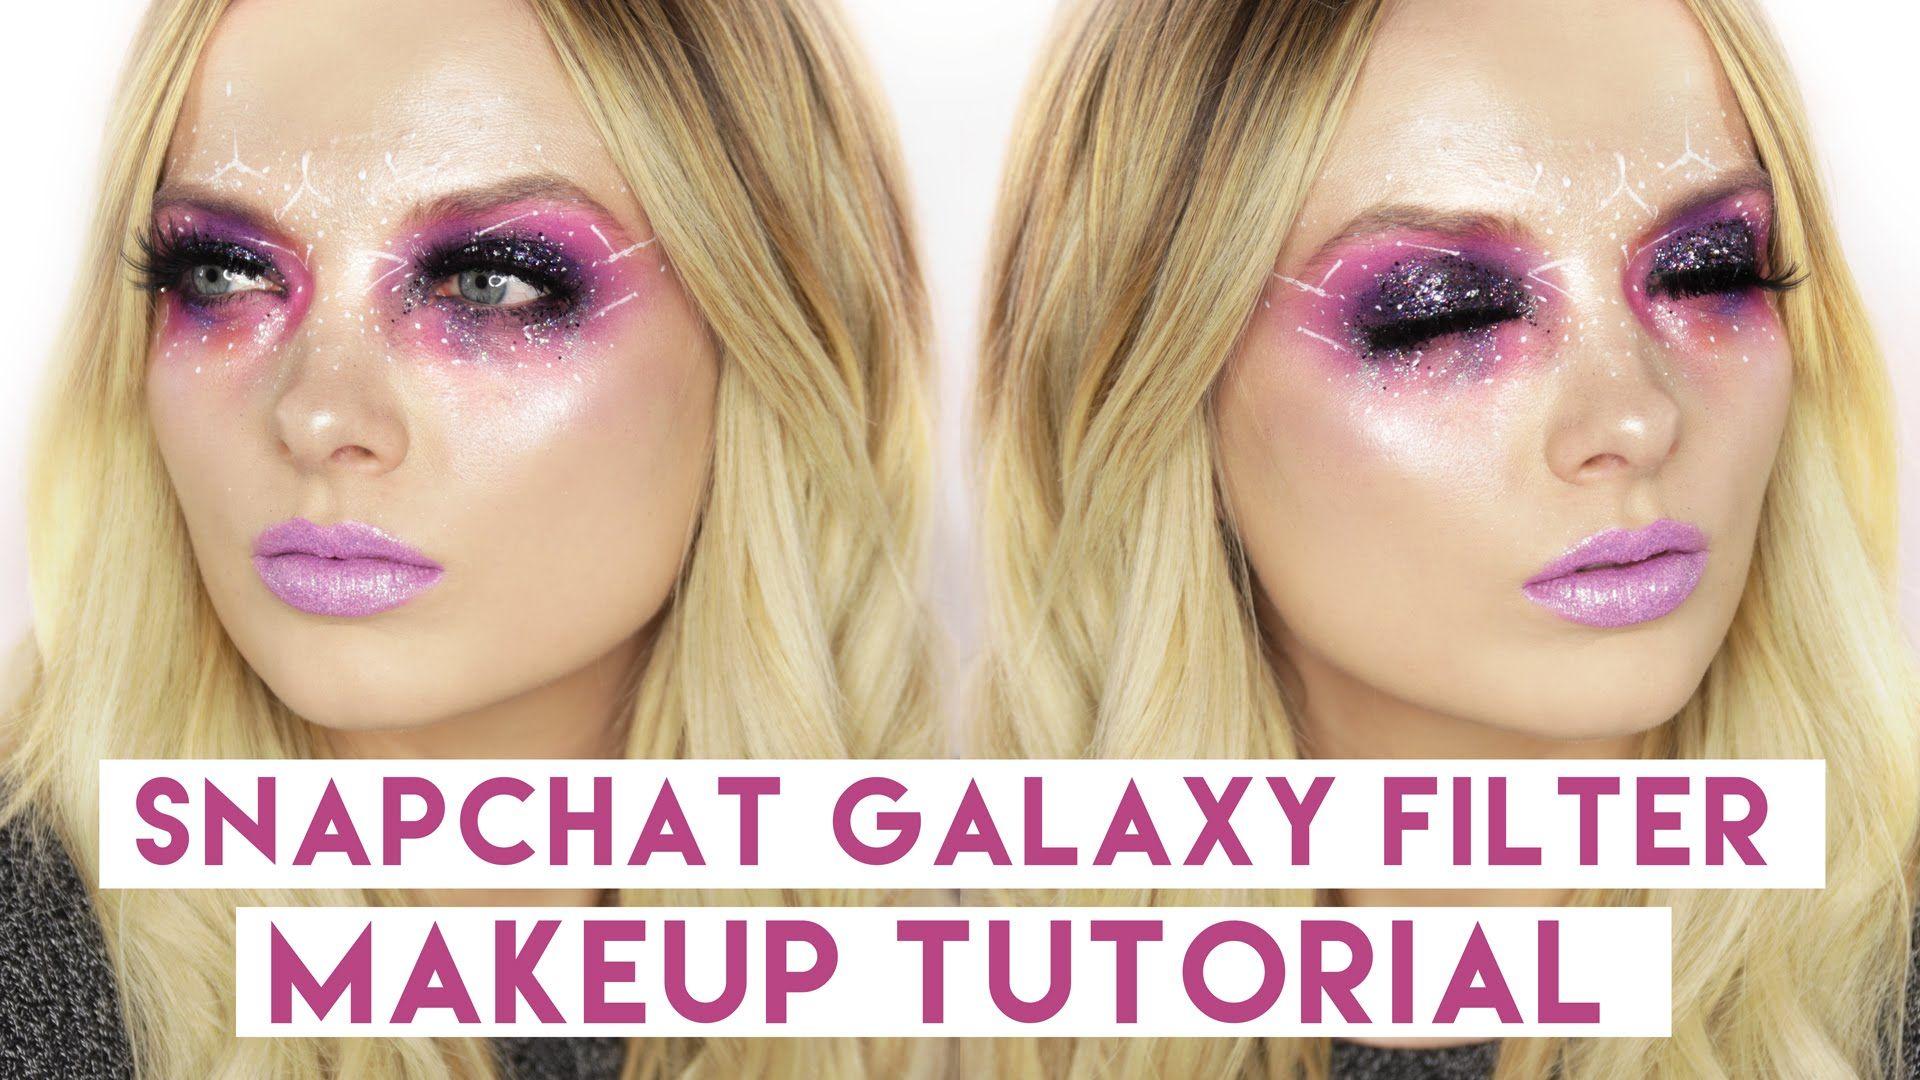 SNAPCHAT Galaxy Filter Makeup Tutorial! // MyPaleSkin